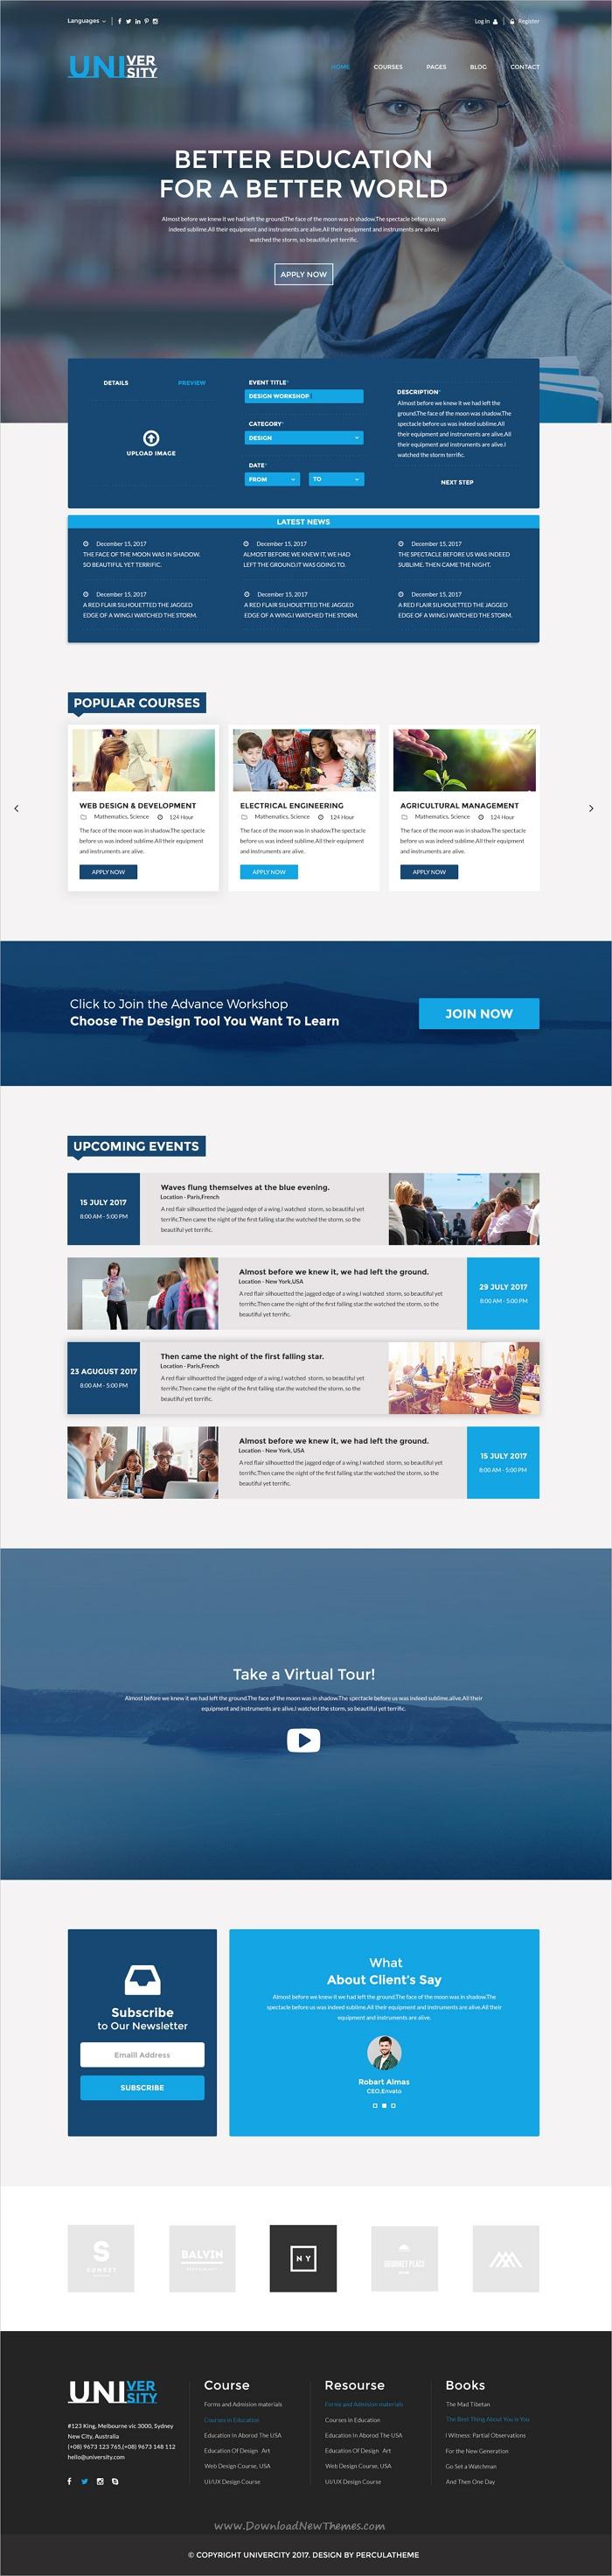 University Educational Psd Template Online Education Courses Right To Education Online Education